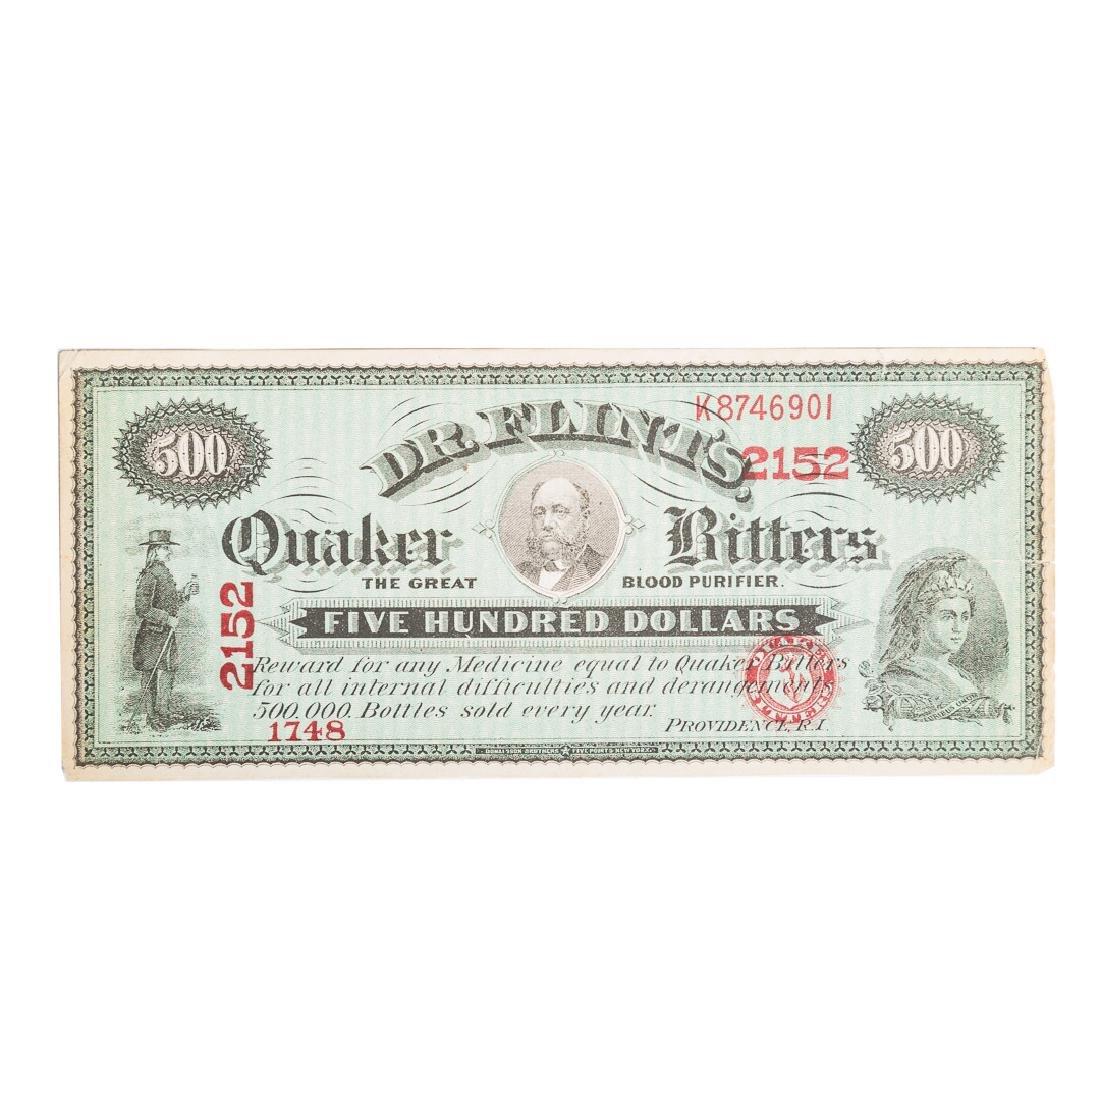 [US] Dr. Flint's Quaker Bitters $500 Advertising